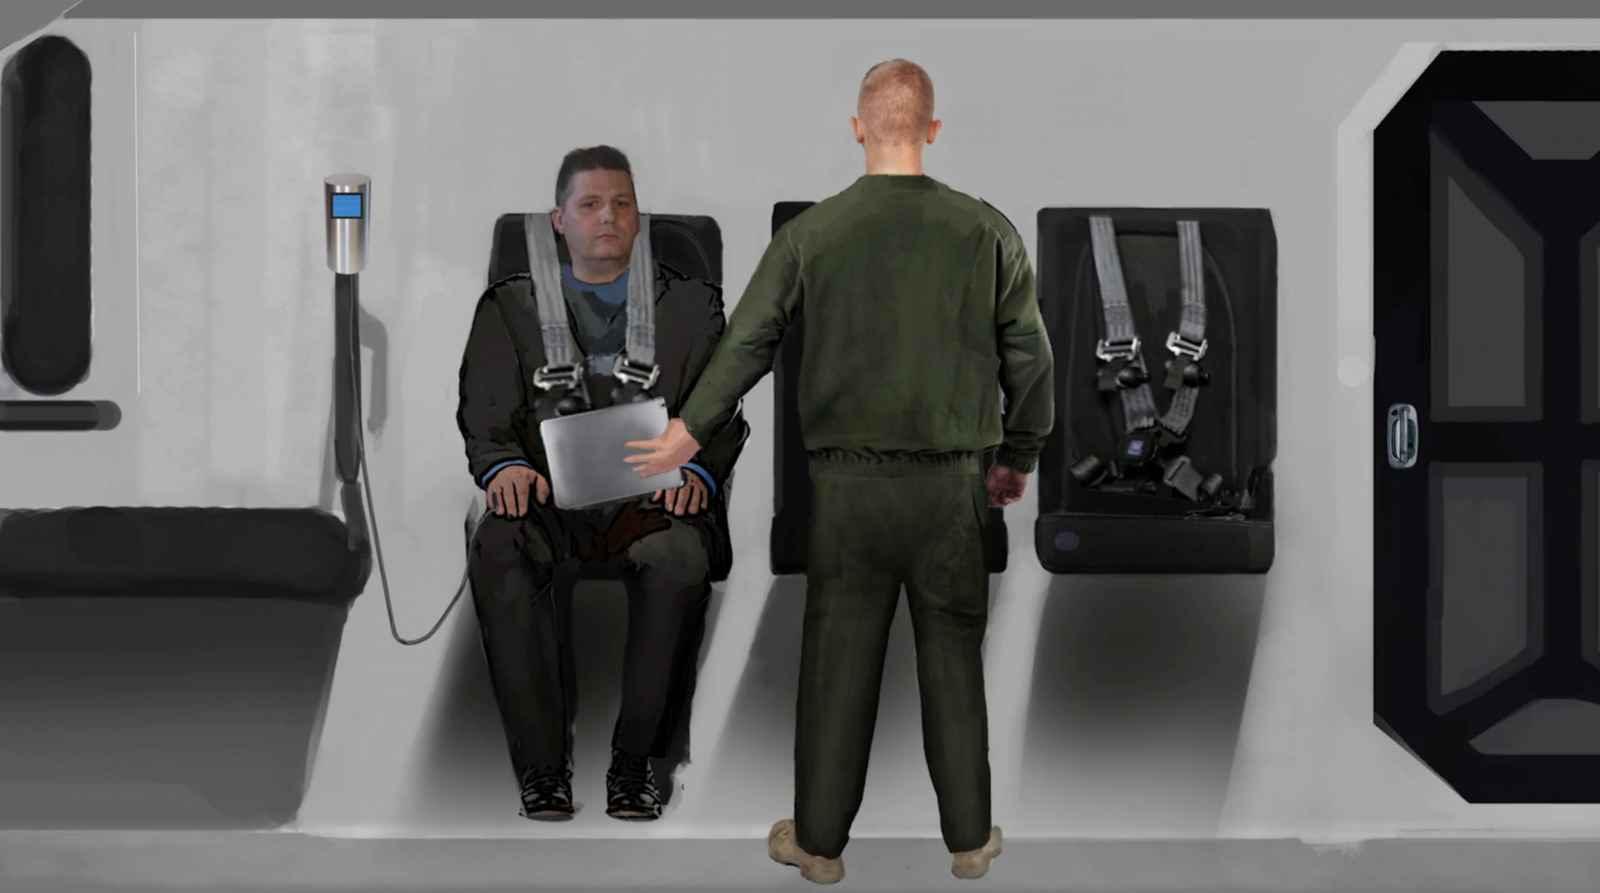 http://de.spherebeingalliance.com/media/img/1600x0/2016-07/3_Corey_being_interrogated.jpg